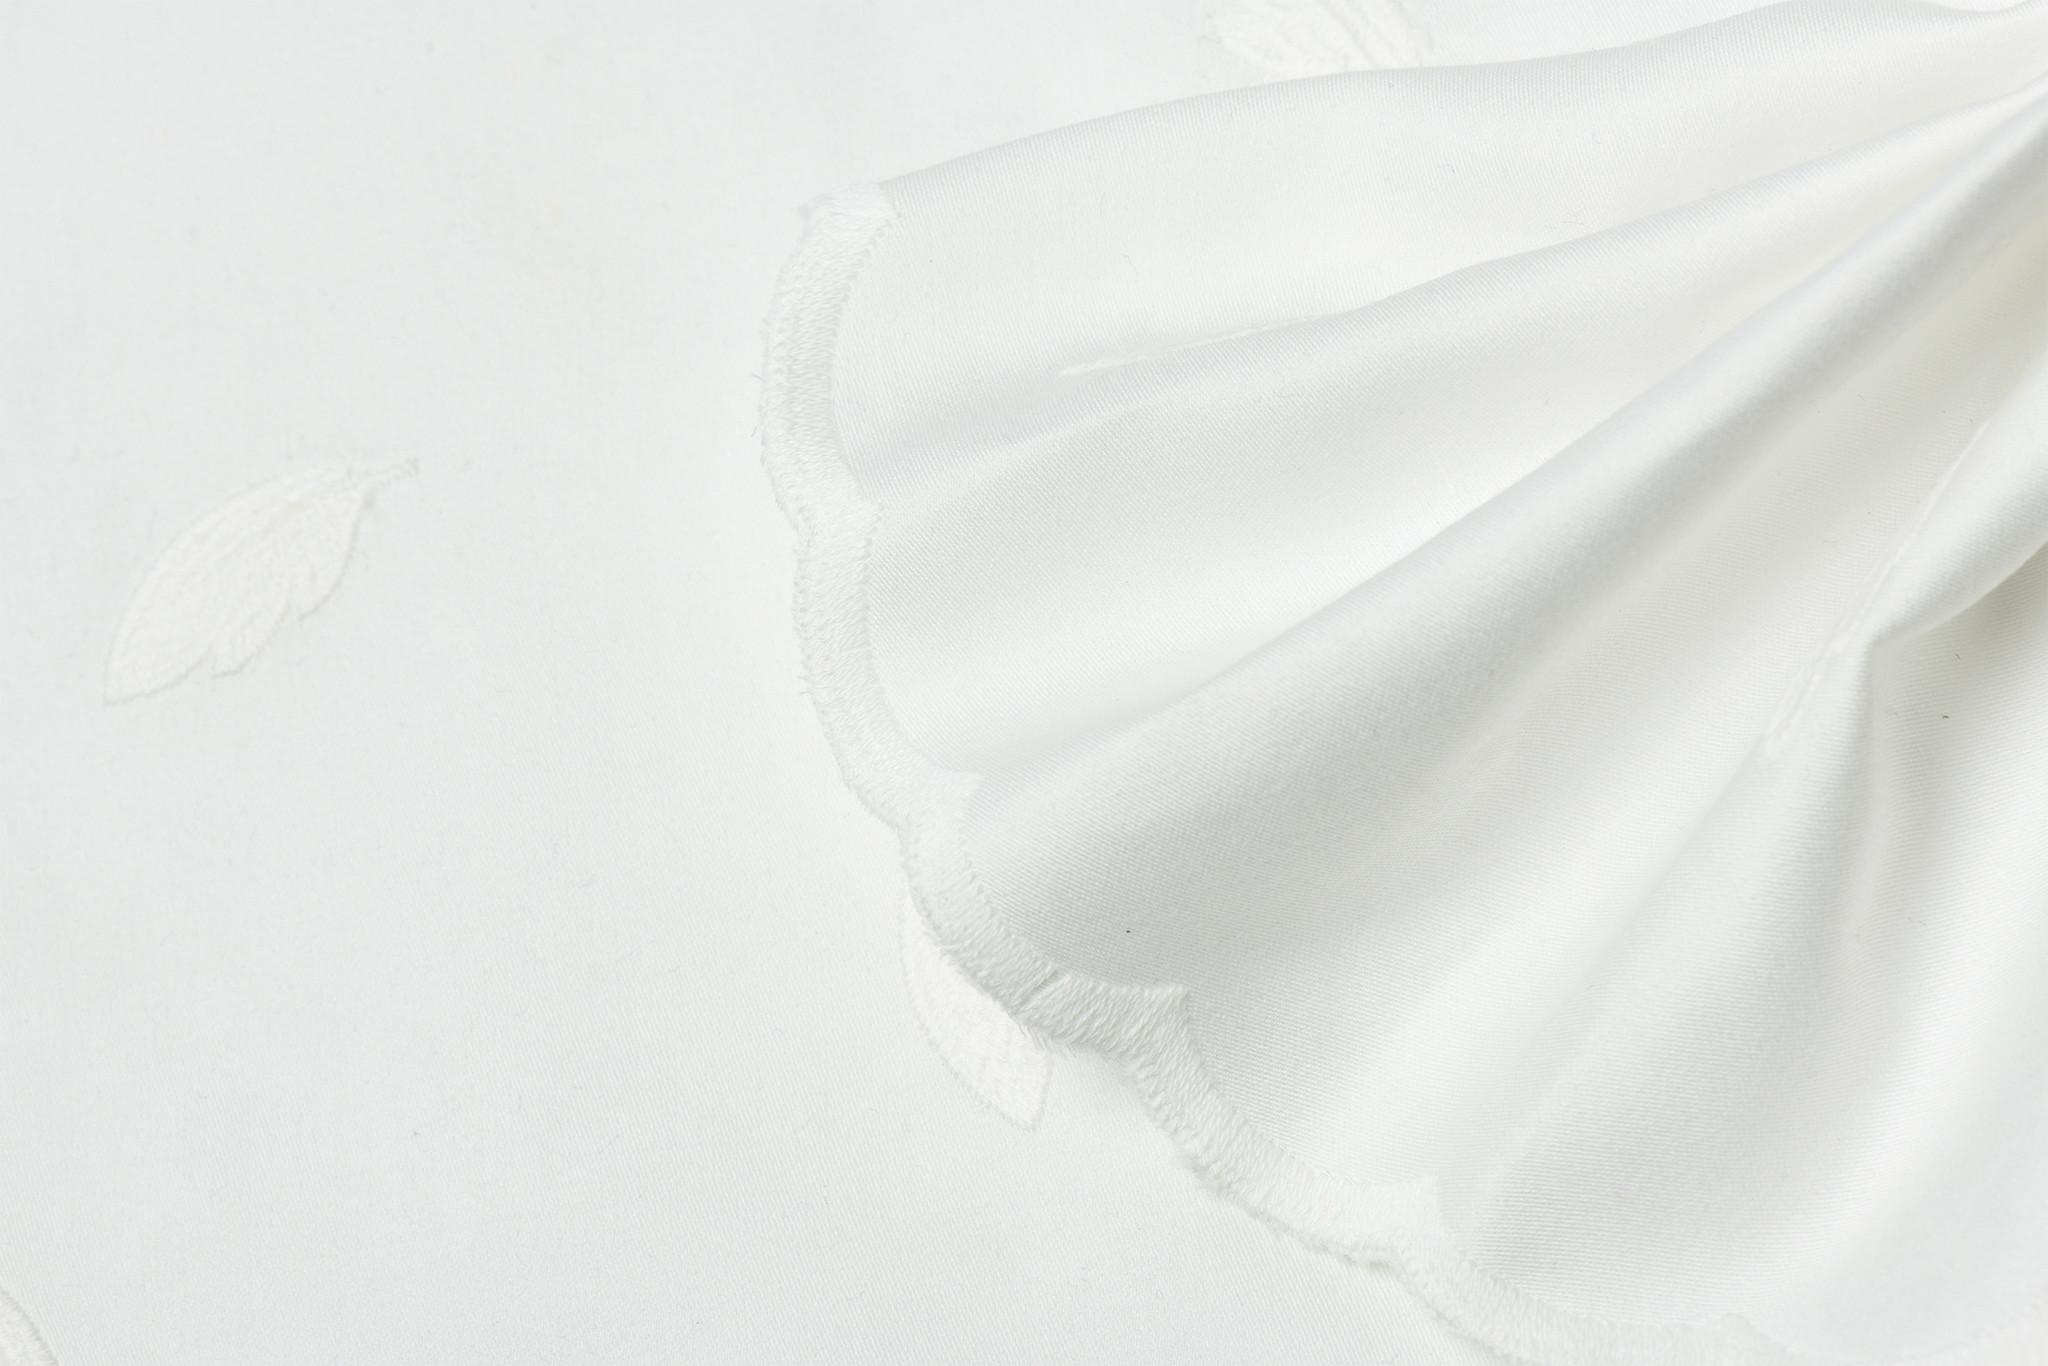 Qjutie Kids Cotton Poplin Embroderie Feathers Ecru